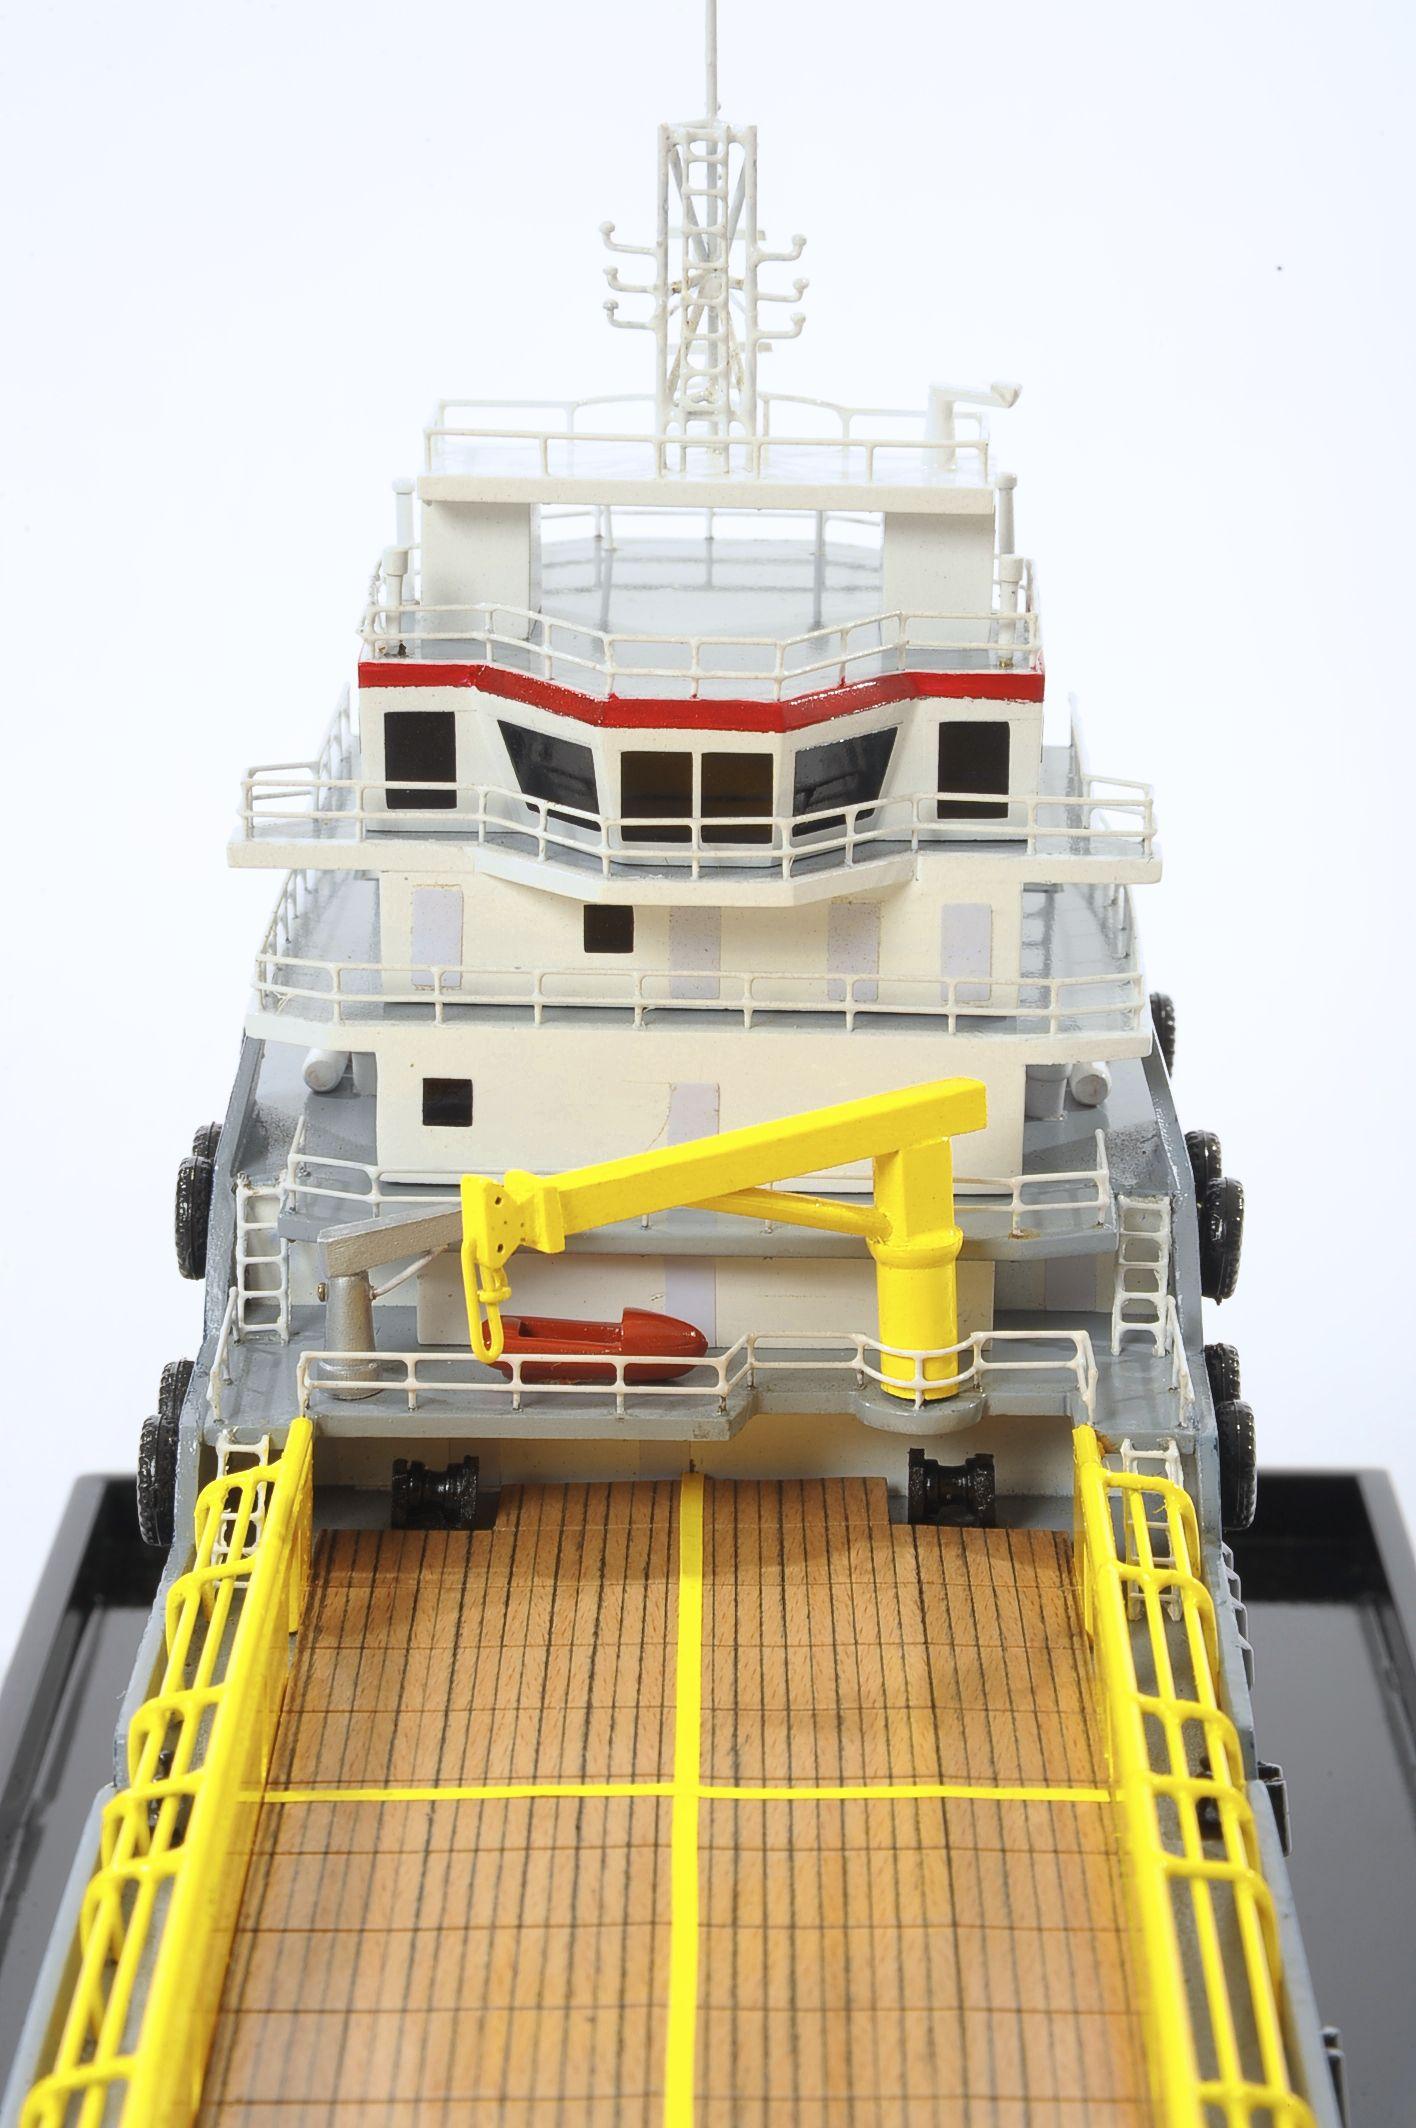 1515-8933-Topaz-Marine-Supply-Vessel-Model-ship